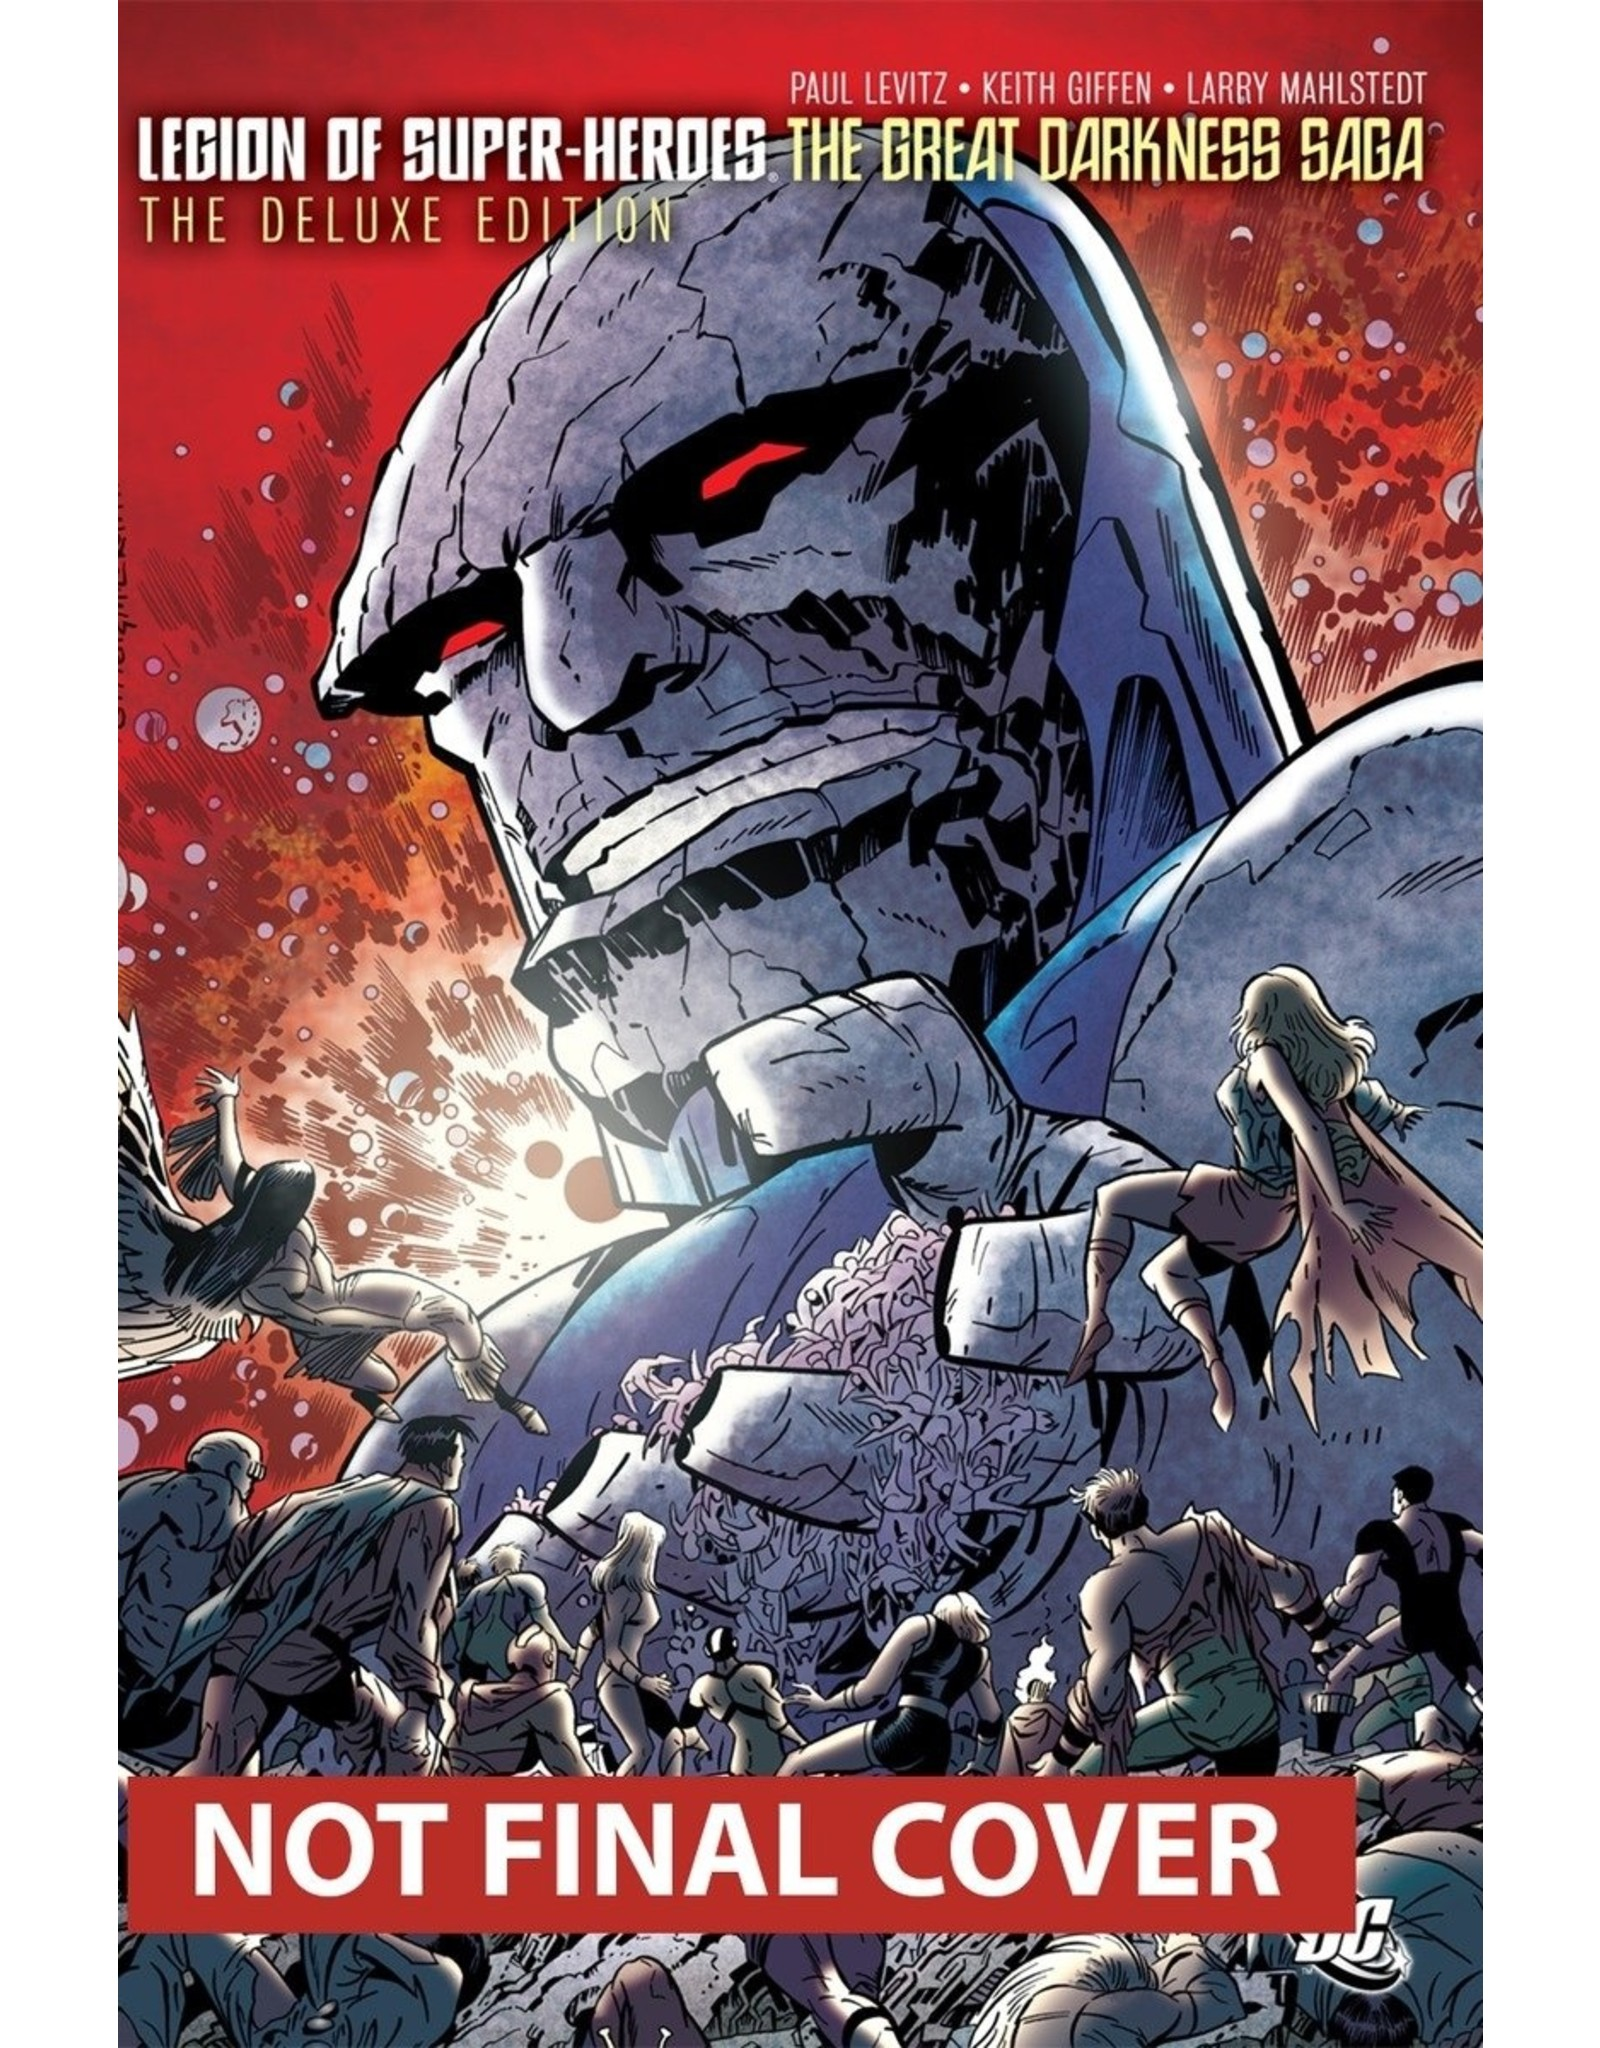 DC COMICS LEGION OF SUPER-HEROES GREAT DARKNESS SAGA DLX HC